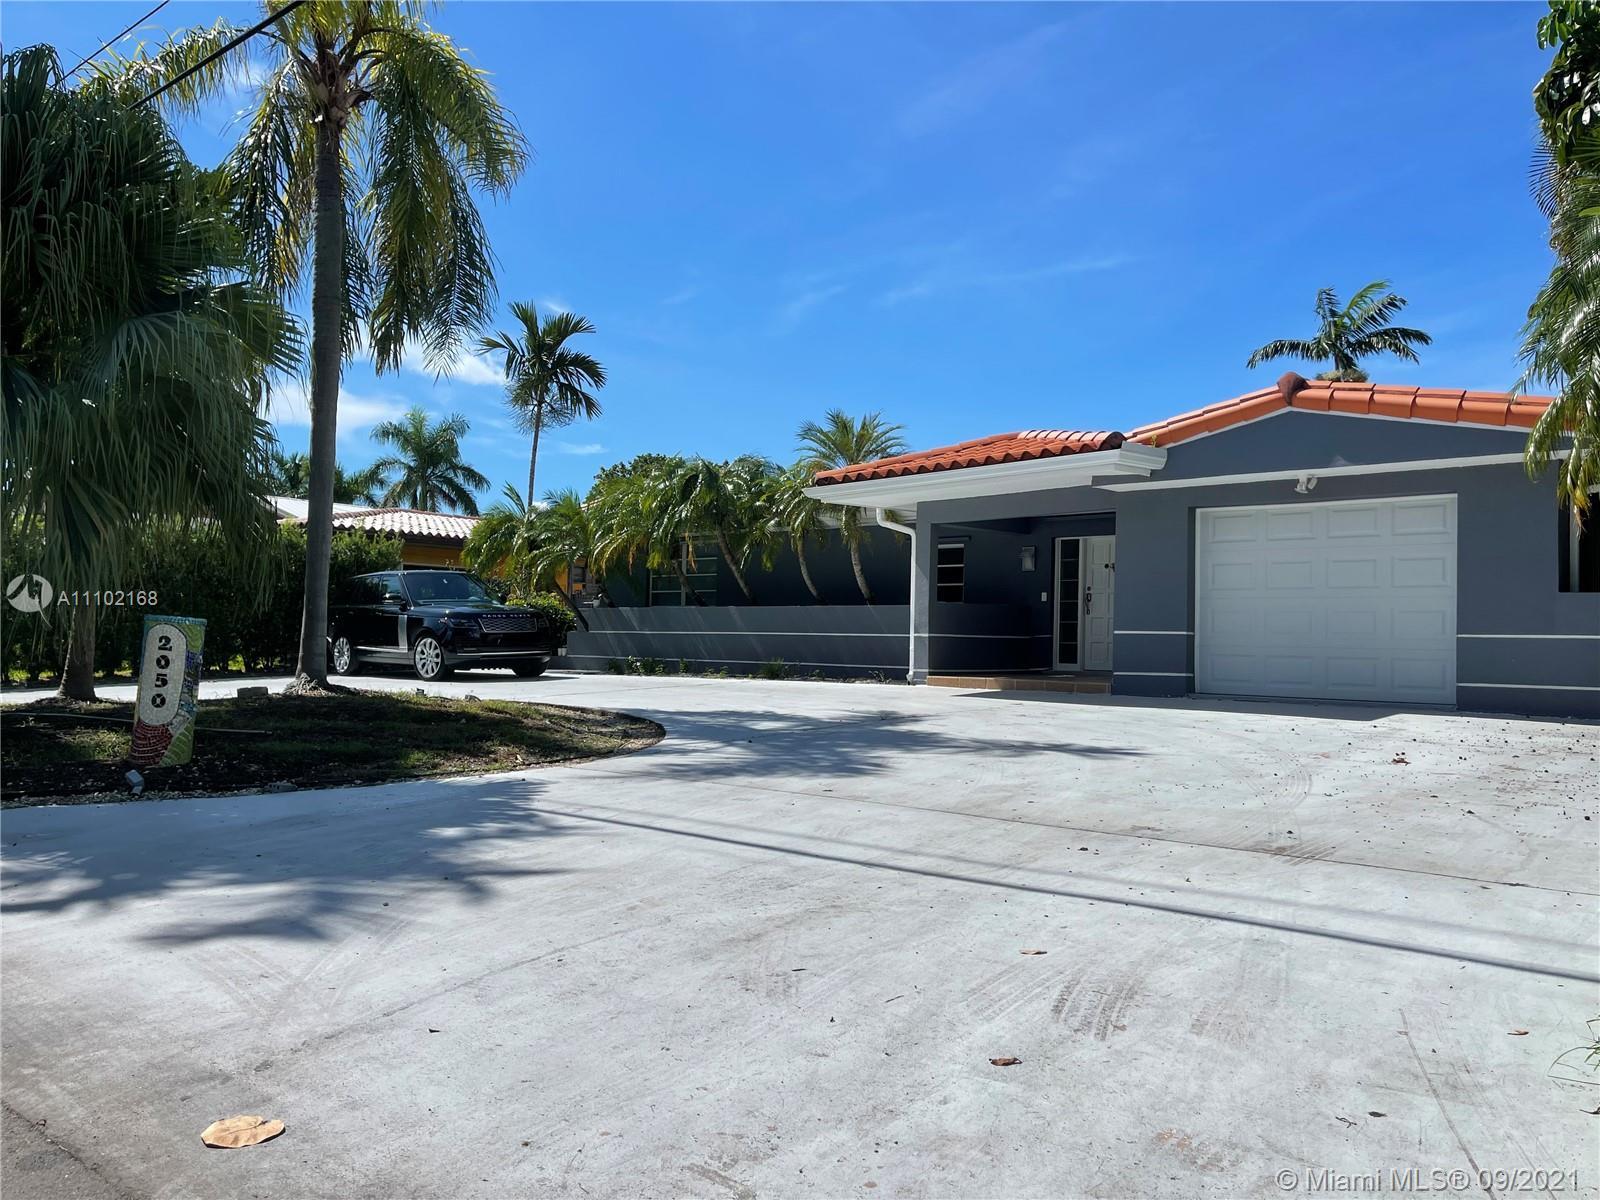 Single Family Home,For Sale,2050 NE 120th Rd, North Miami, Florida 33181,Brickell,realty,broker,condos near me